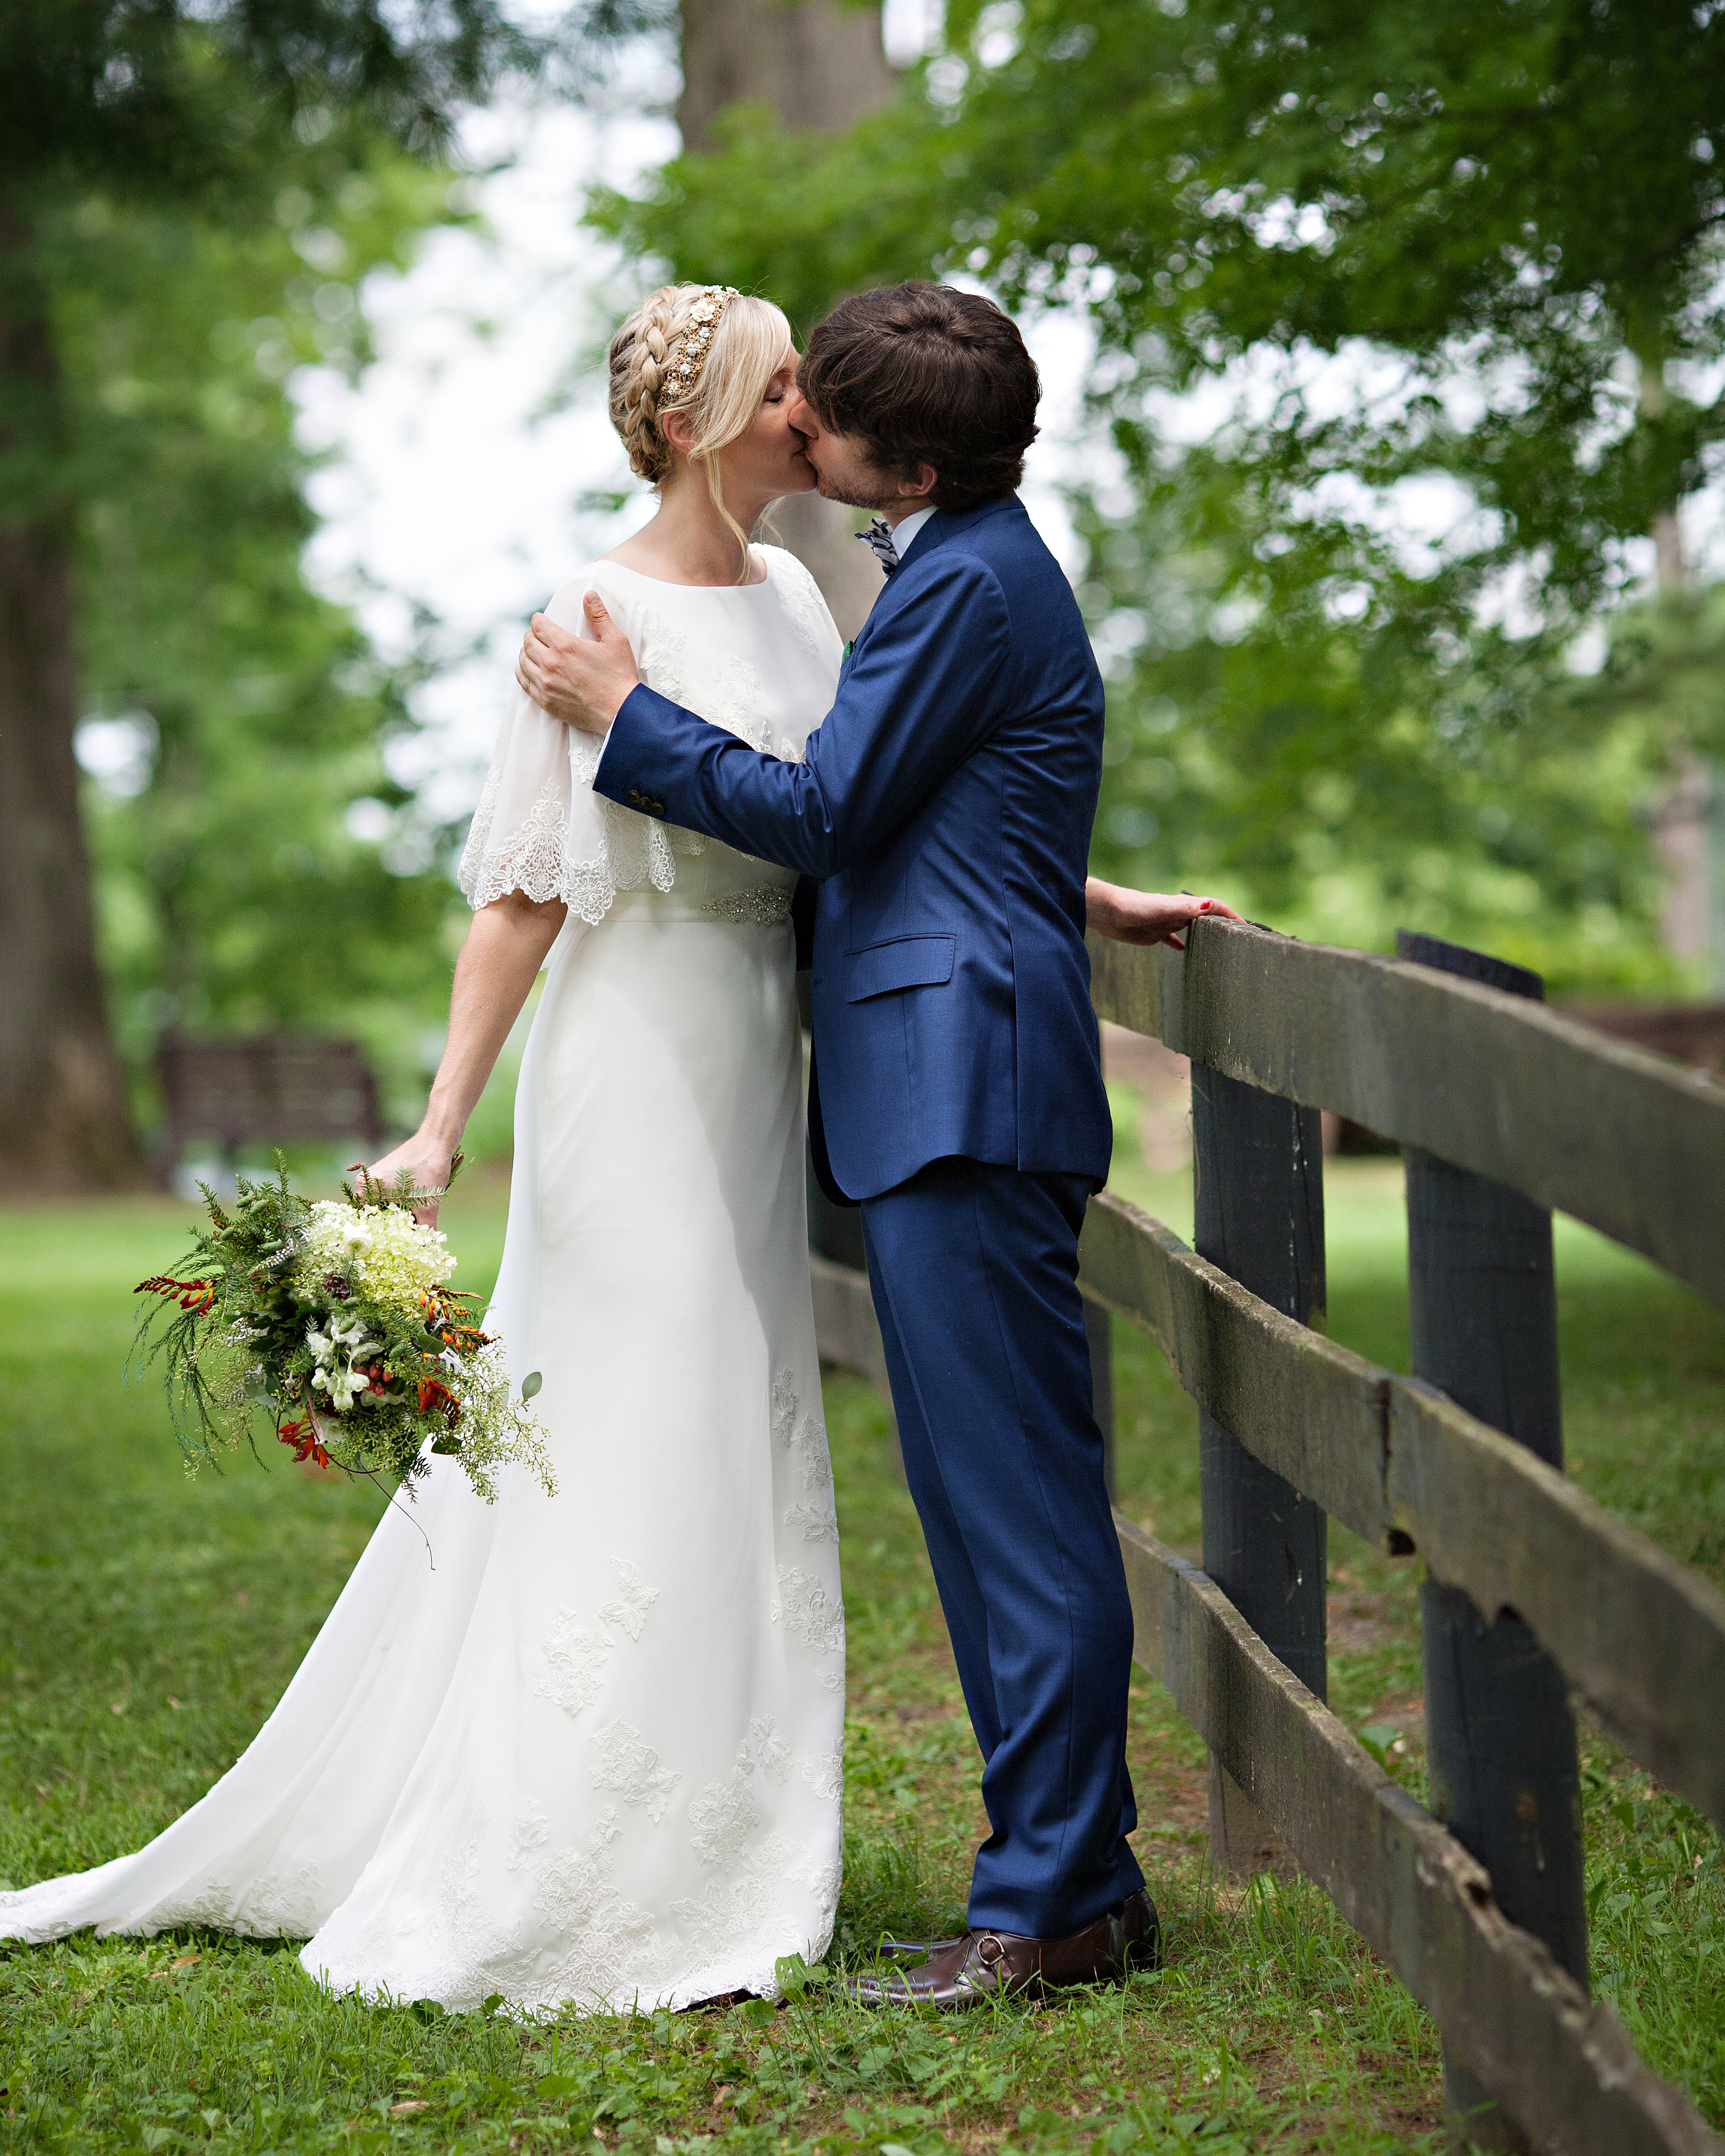 kristy-marc-wedding-portrait5-0414.jpg